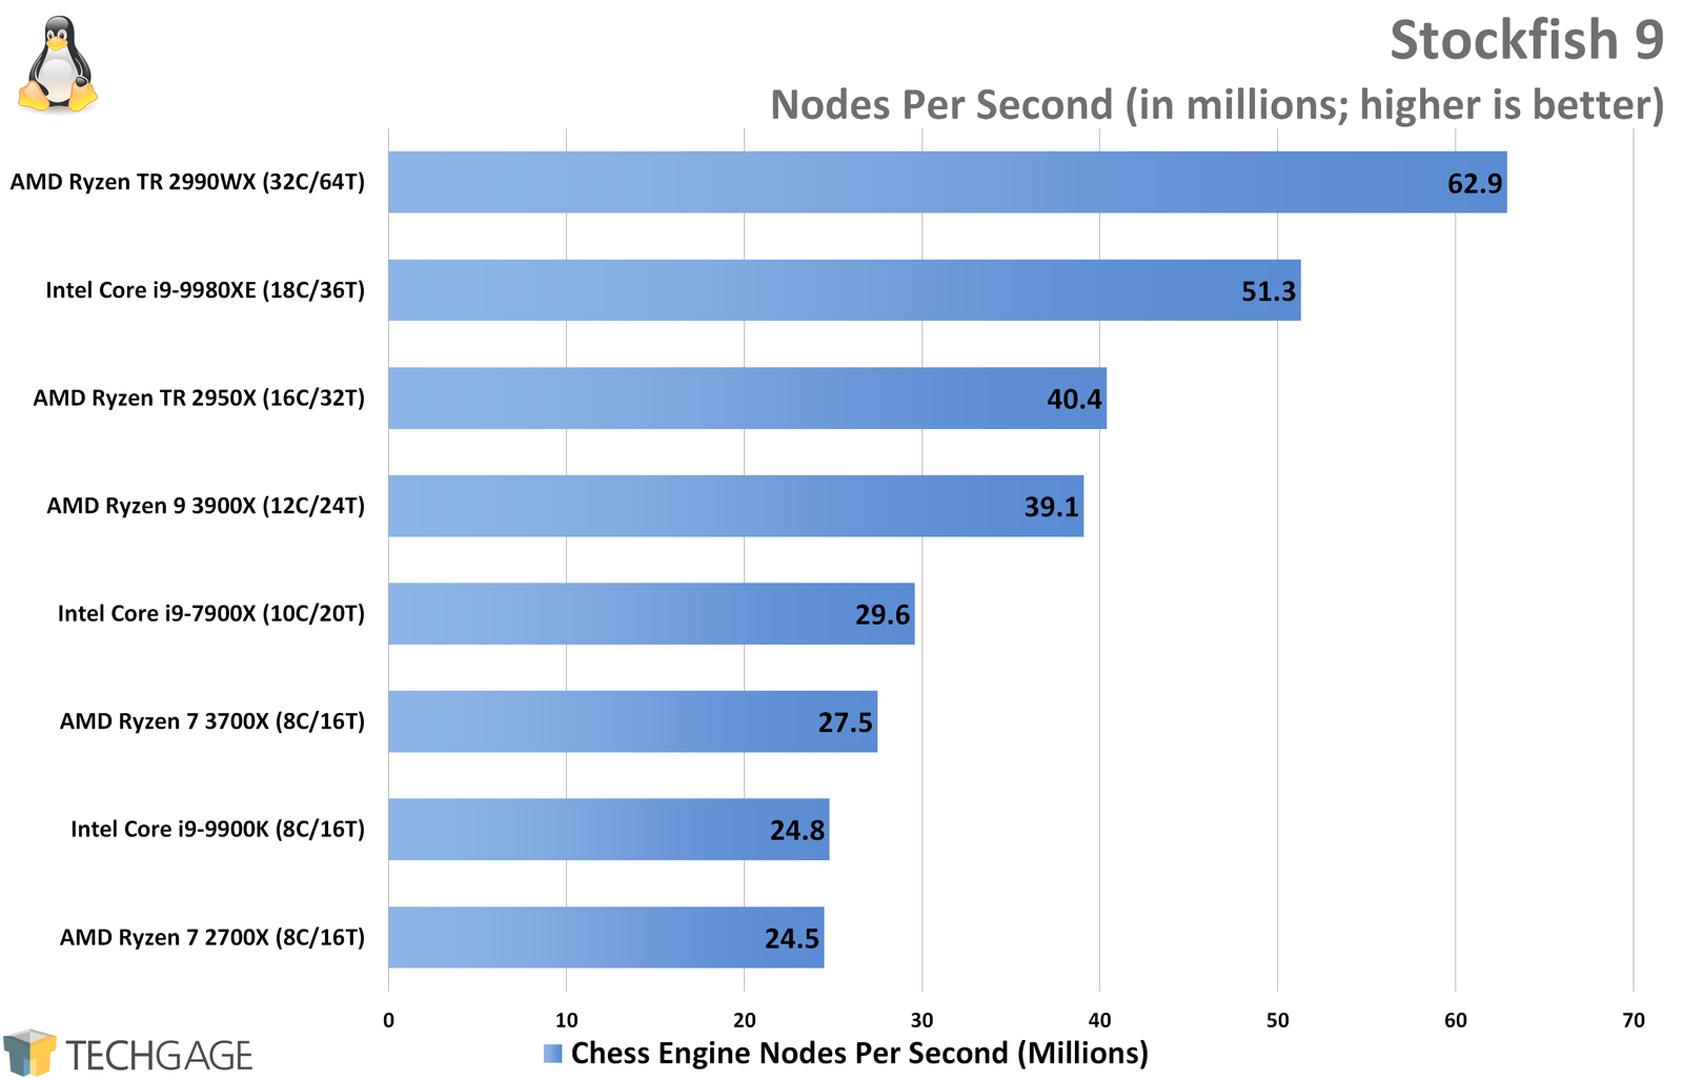 Chess Engine Performance (Stockfish, AMD Ryzen 9 3900X and 7 3700X)